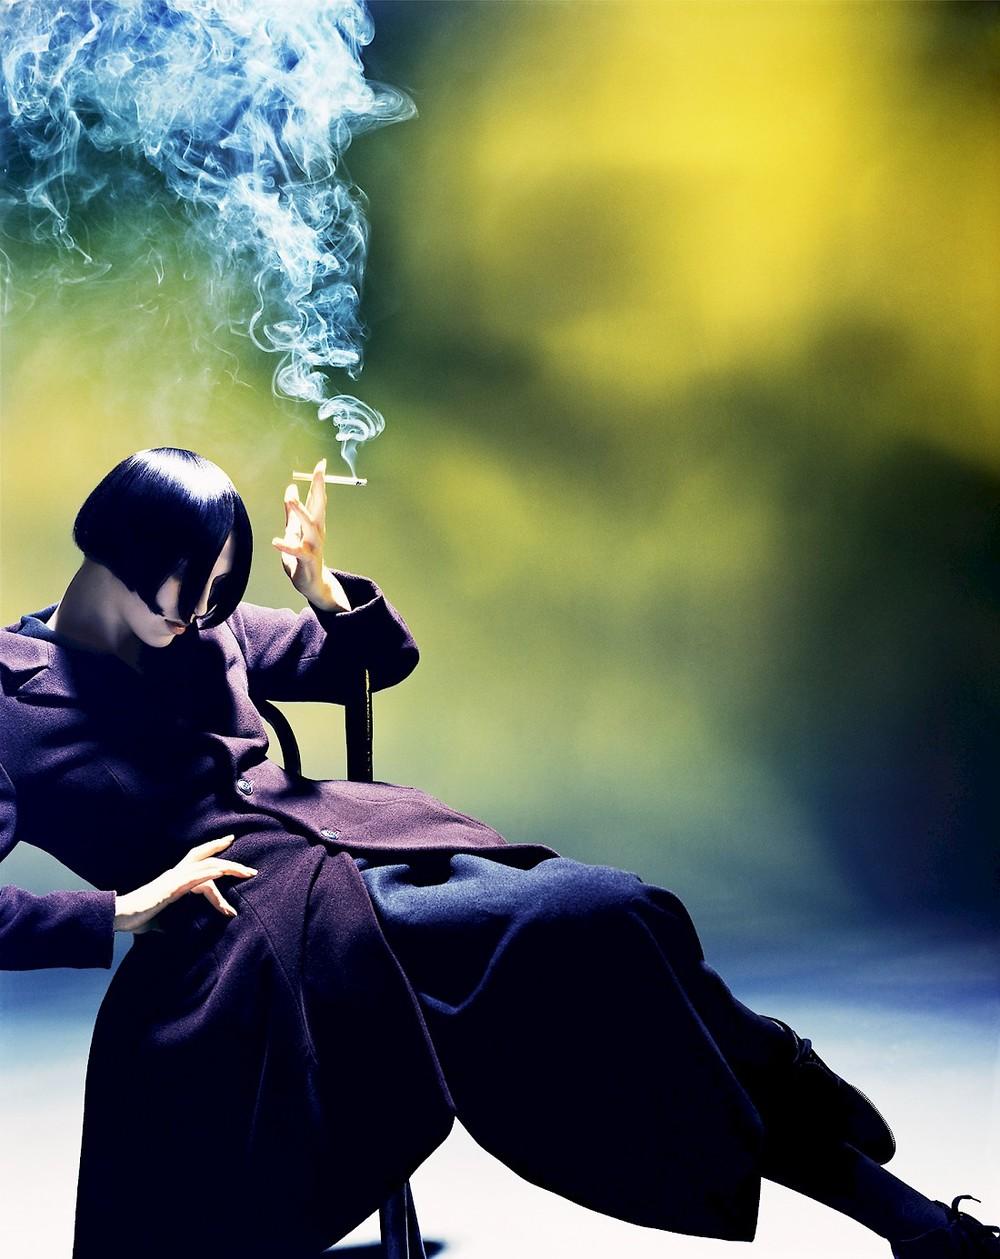 guillaumeladvie :     Nick Knight - Susie Smoking, Yohji Yamamoto, 1988